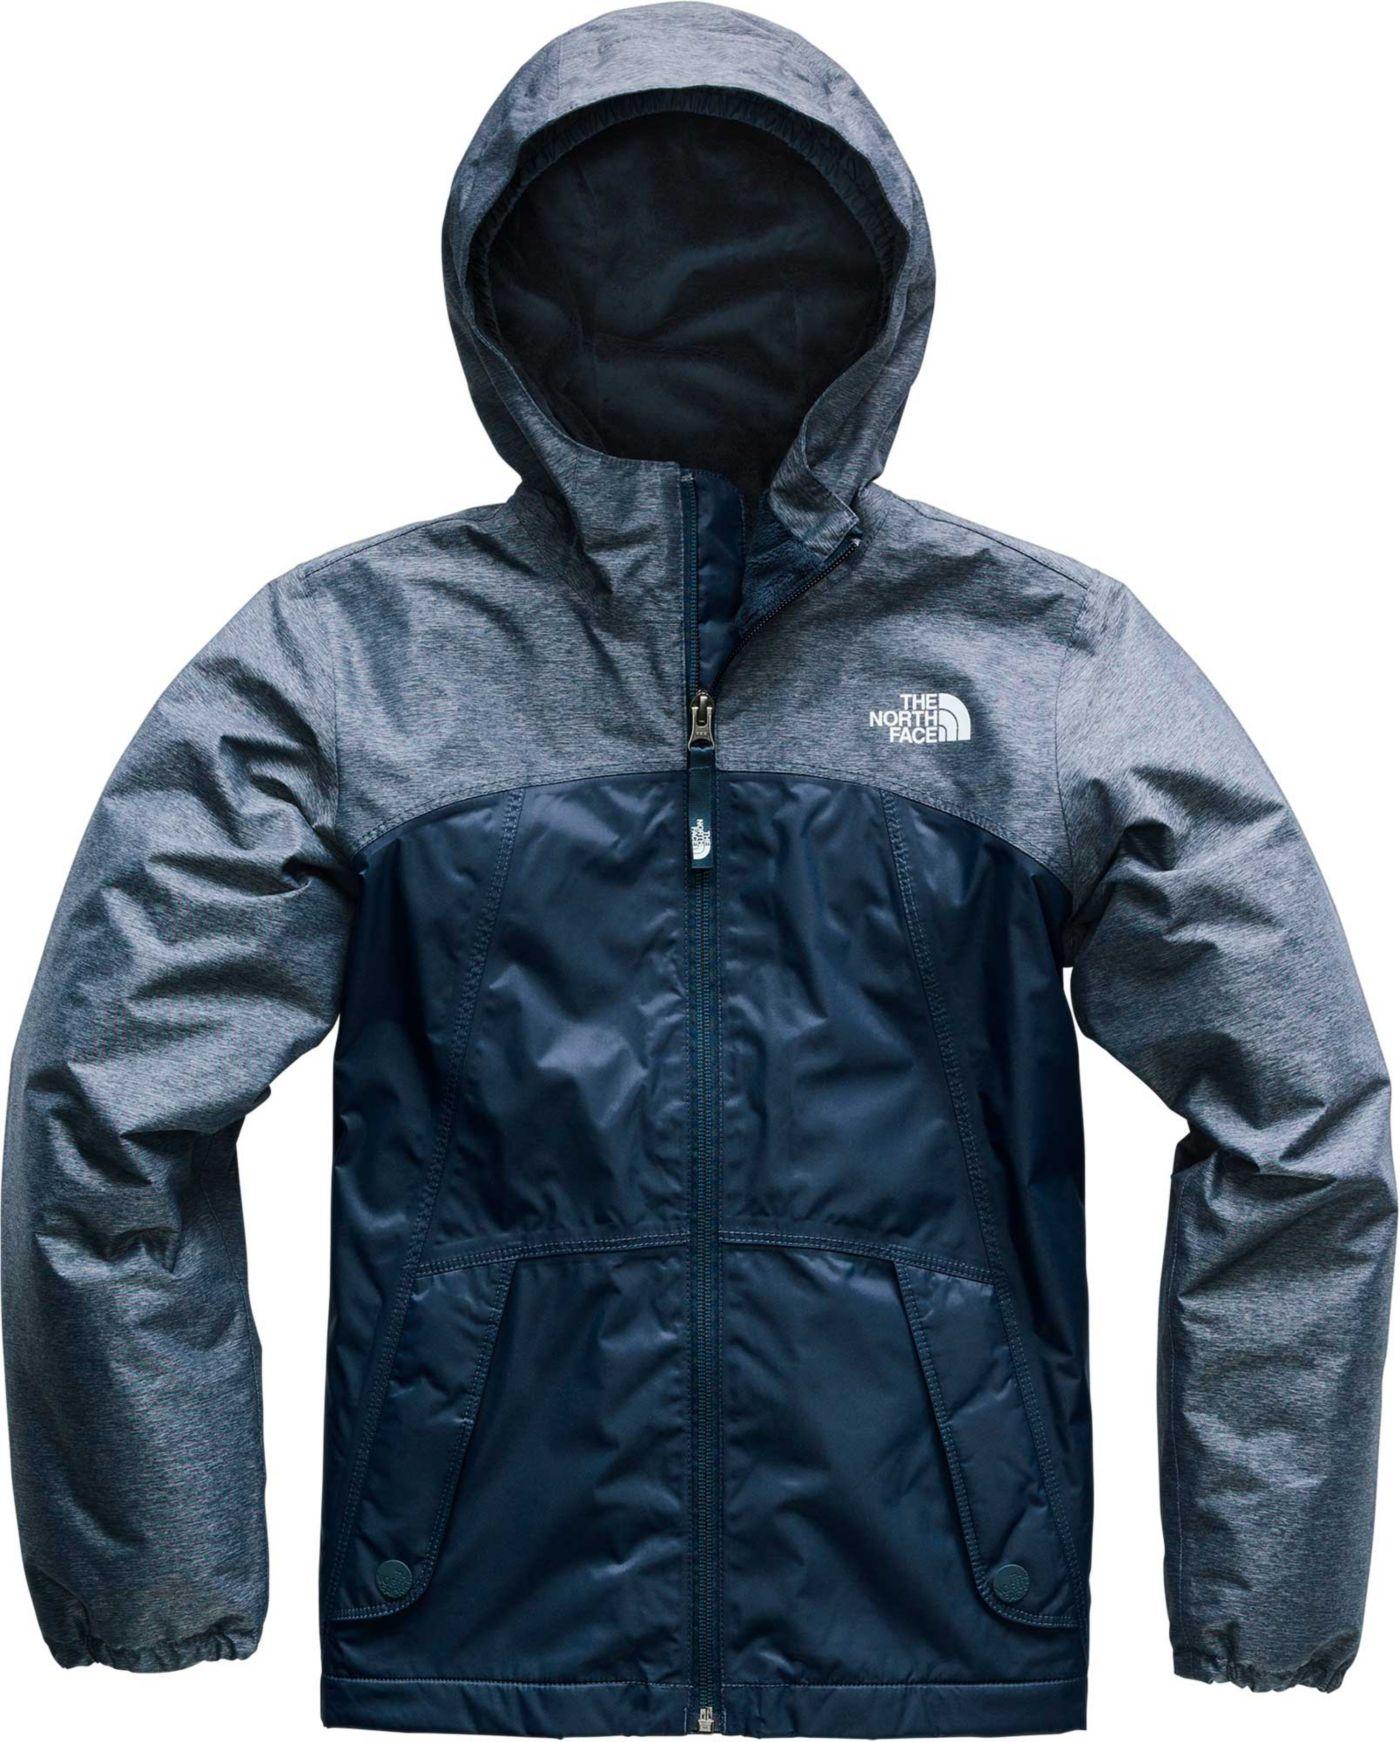 The North Face Girls' Warm Storm Rain Jacket